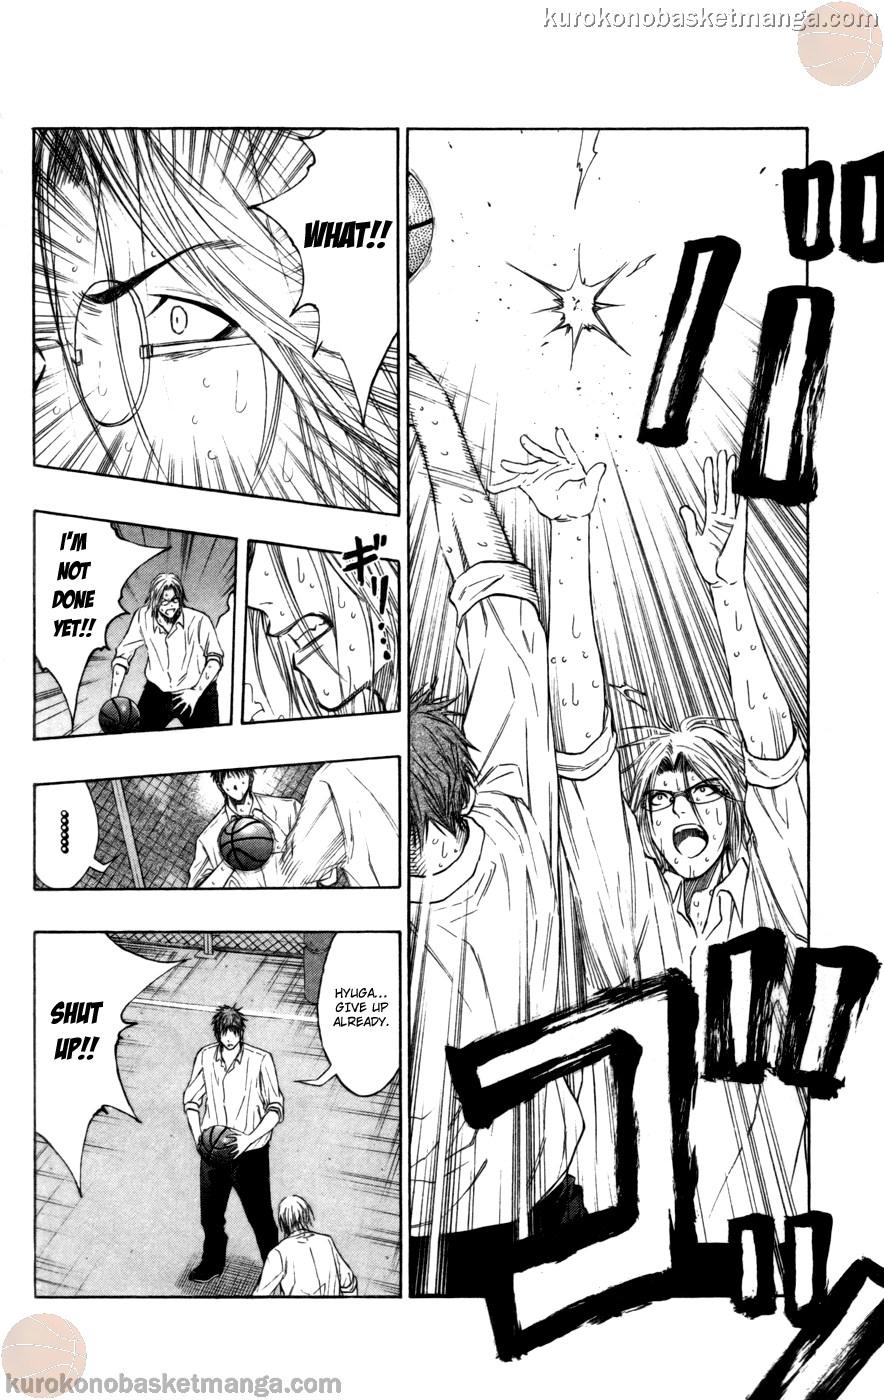 Kuroko no Basket Manga Chapter 96 - Image 16